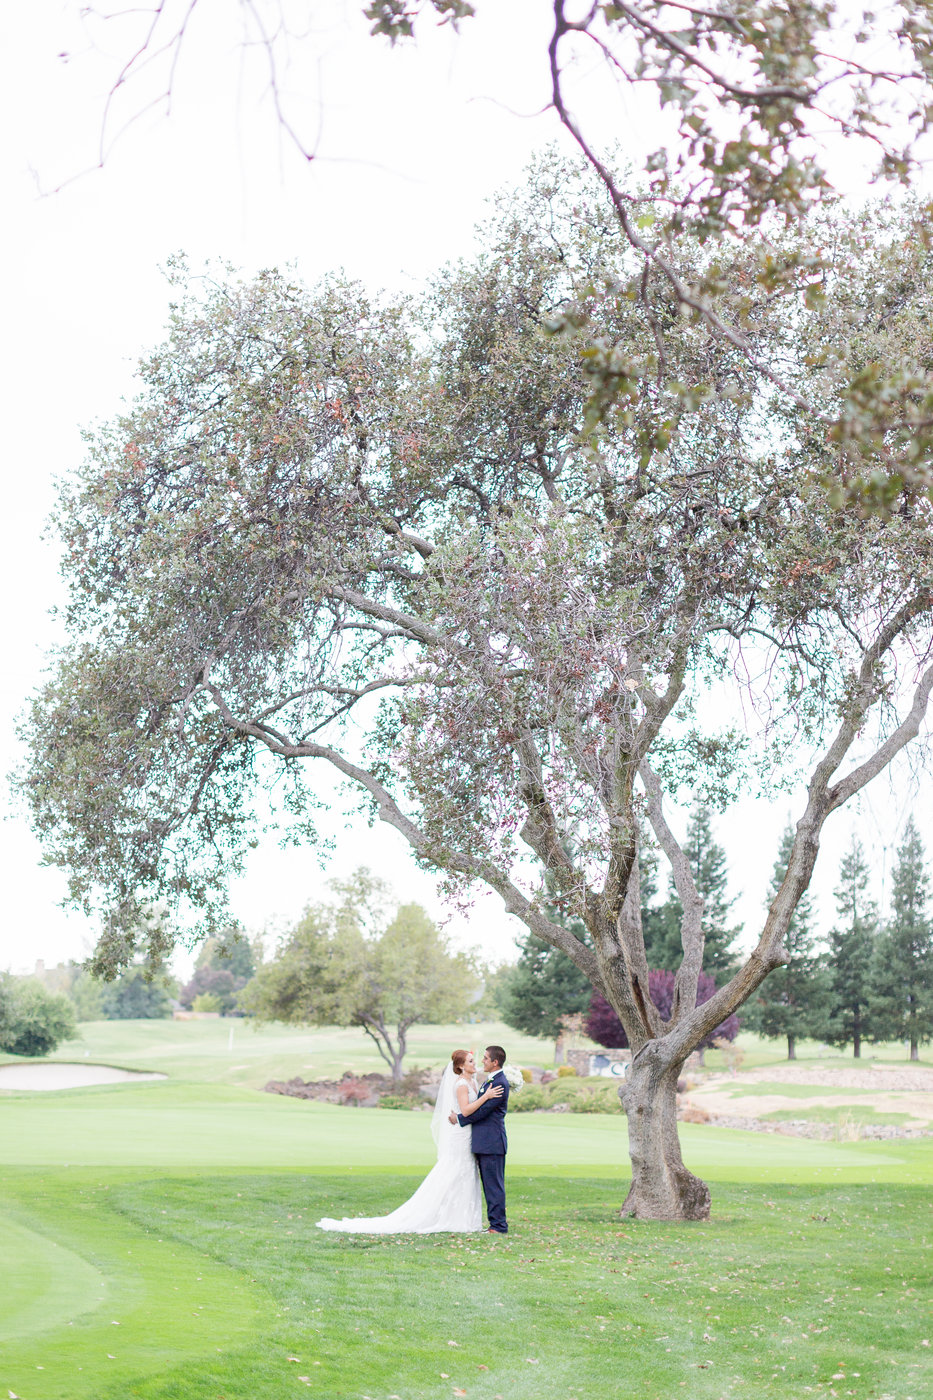 oudoor-photos-on-the-canyon-oaks-country-club-wedding-venue-chico-ca.jpg